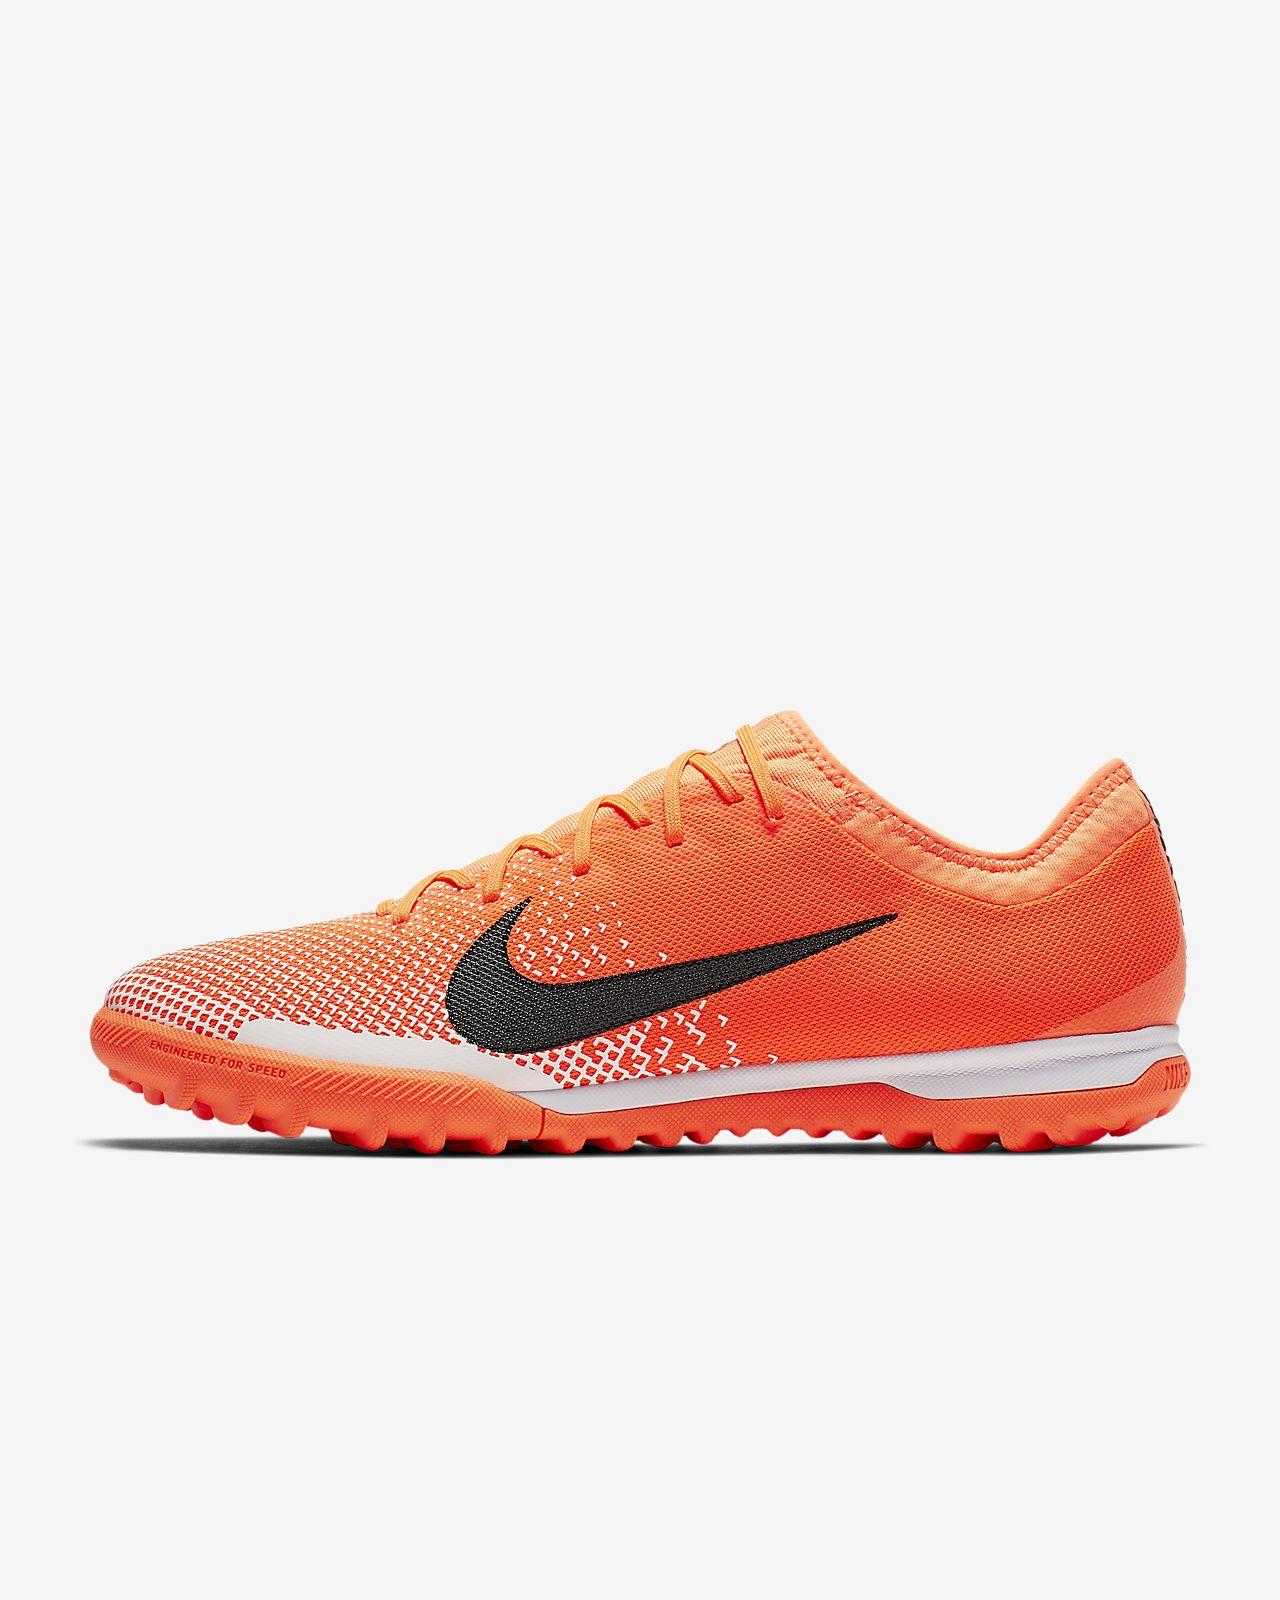 premium selection e0bda 3a62c ... Chaussure de football pour surface synthétique Nike MercurialX Vapor  XII Pro TF